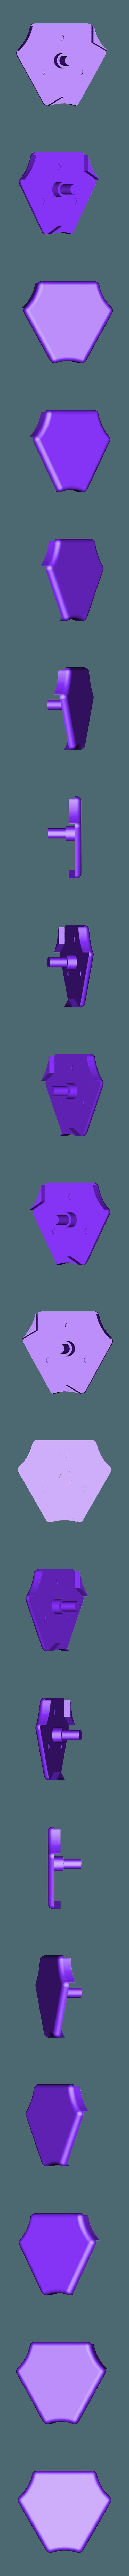 plate.stl Download free STL file Anycubic Kossel 608 Bearing Top Spool Holder • 3D printable model, VICLER